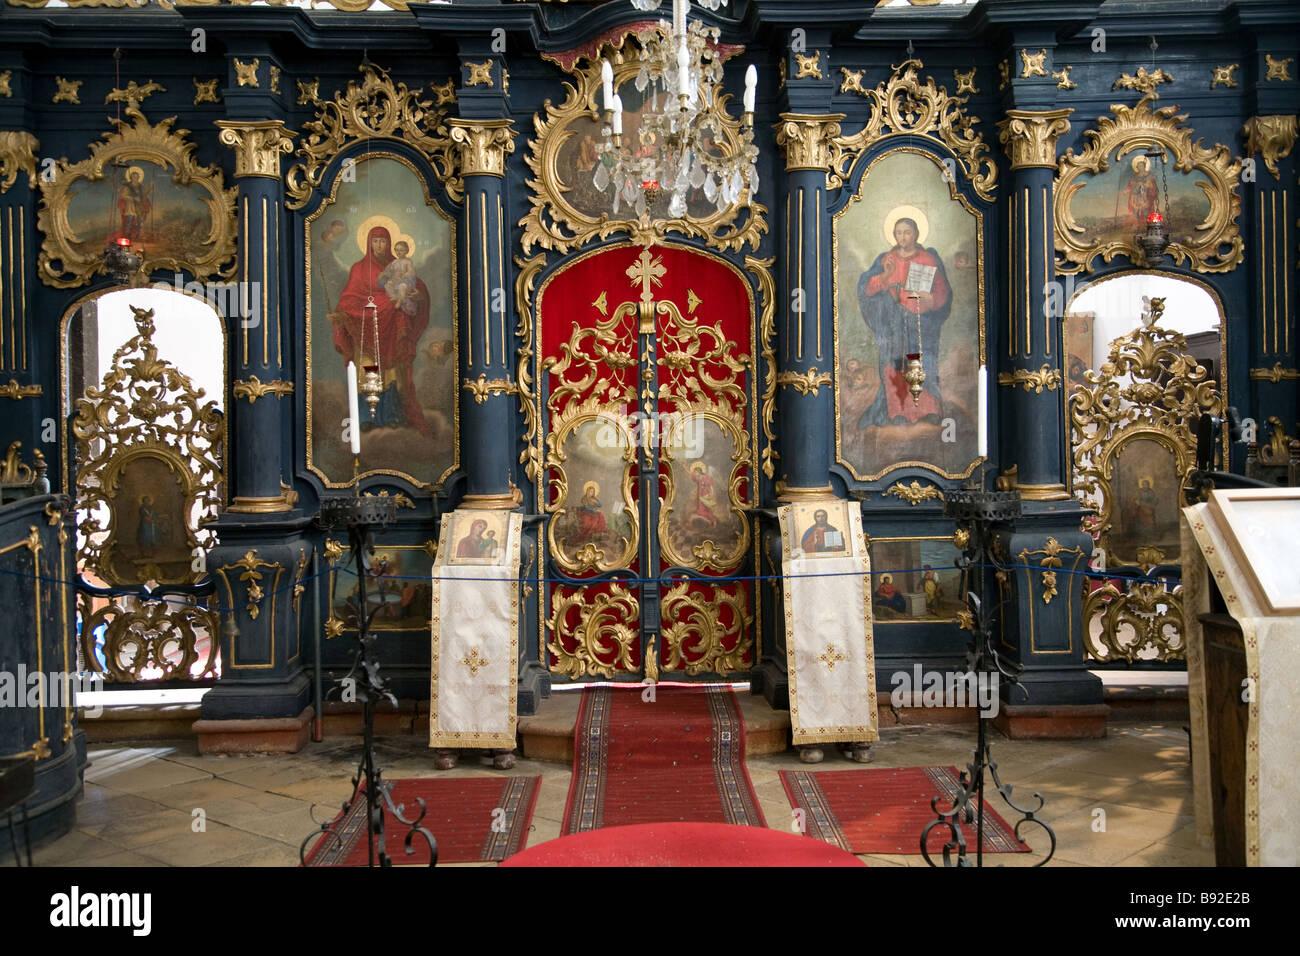 Ornate interior of Serbian Orthodox Church Blagovestenska Templom in Szentendre near Budapest - Stock Image